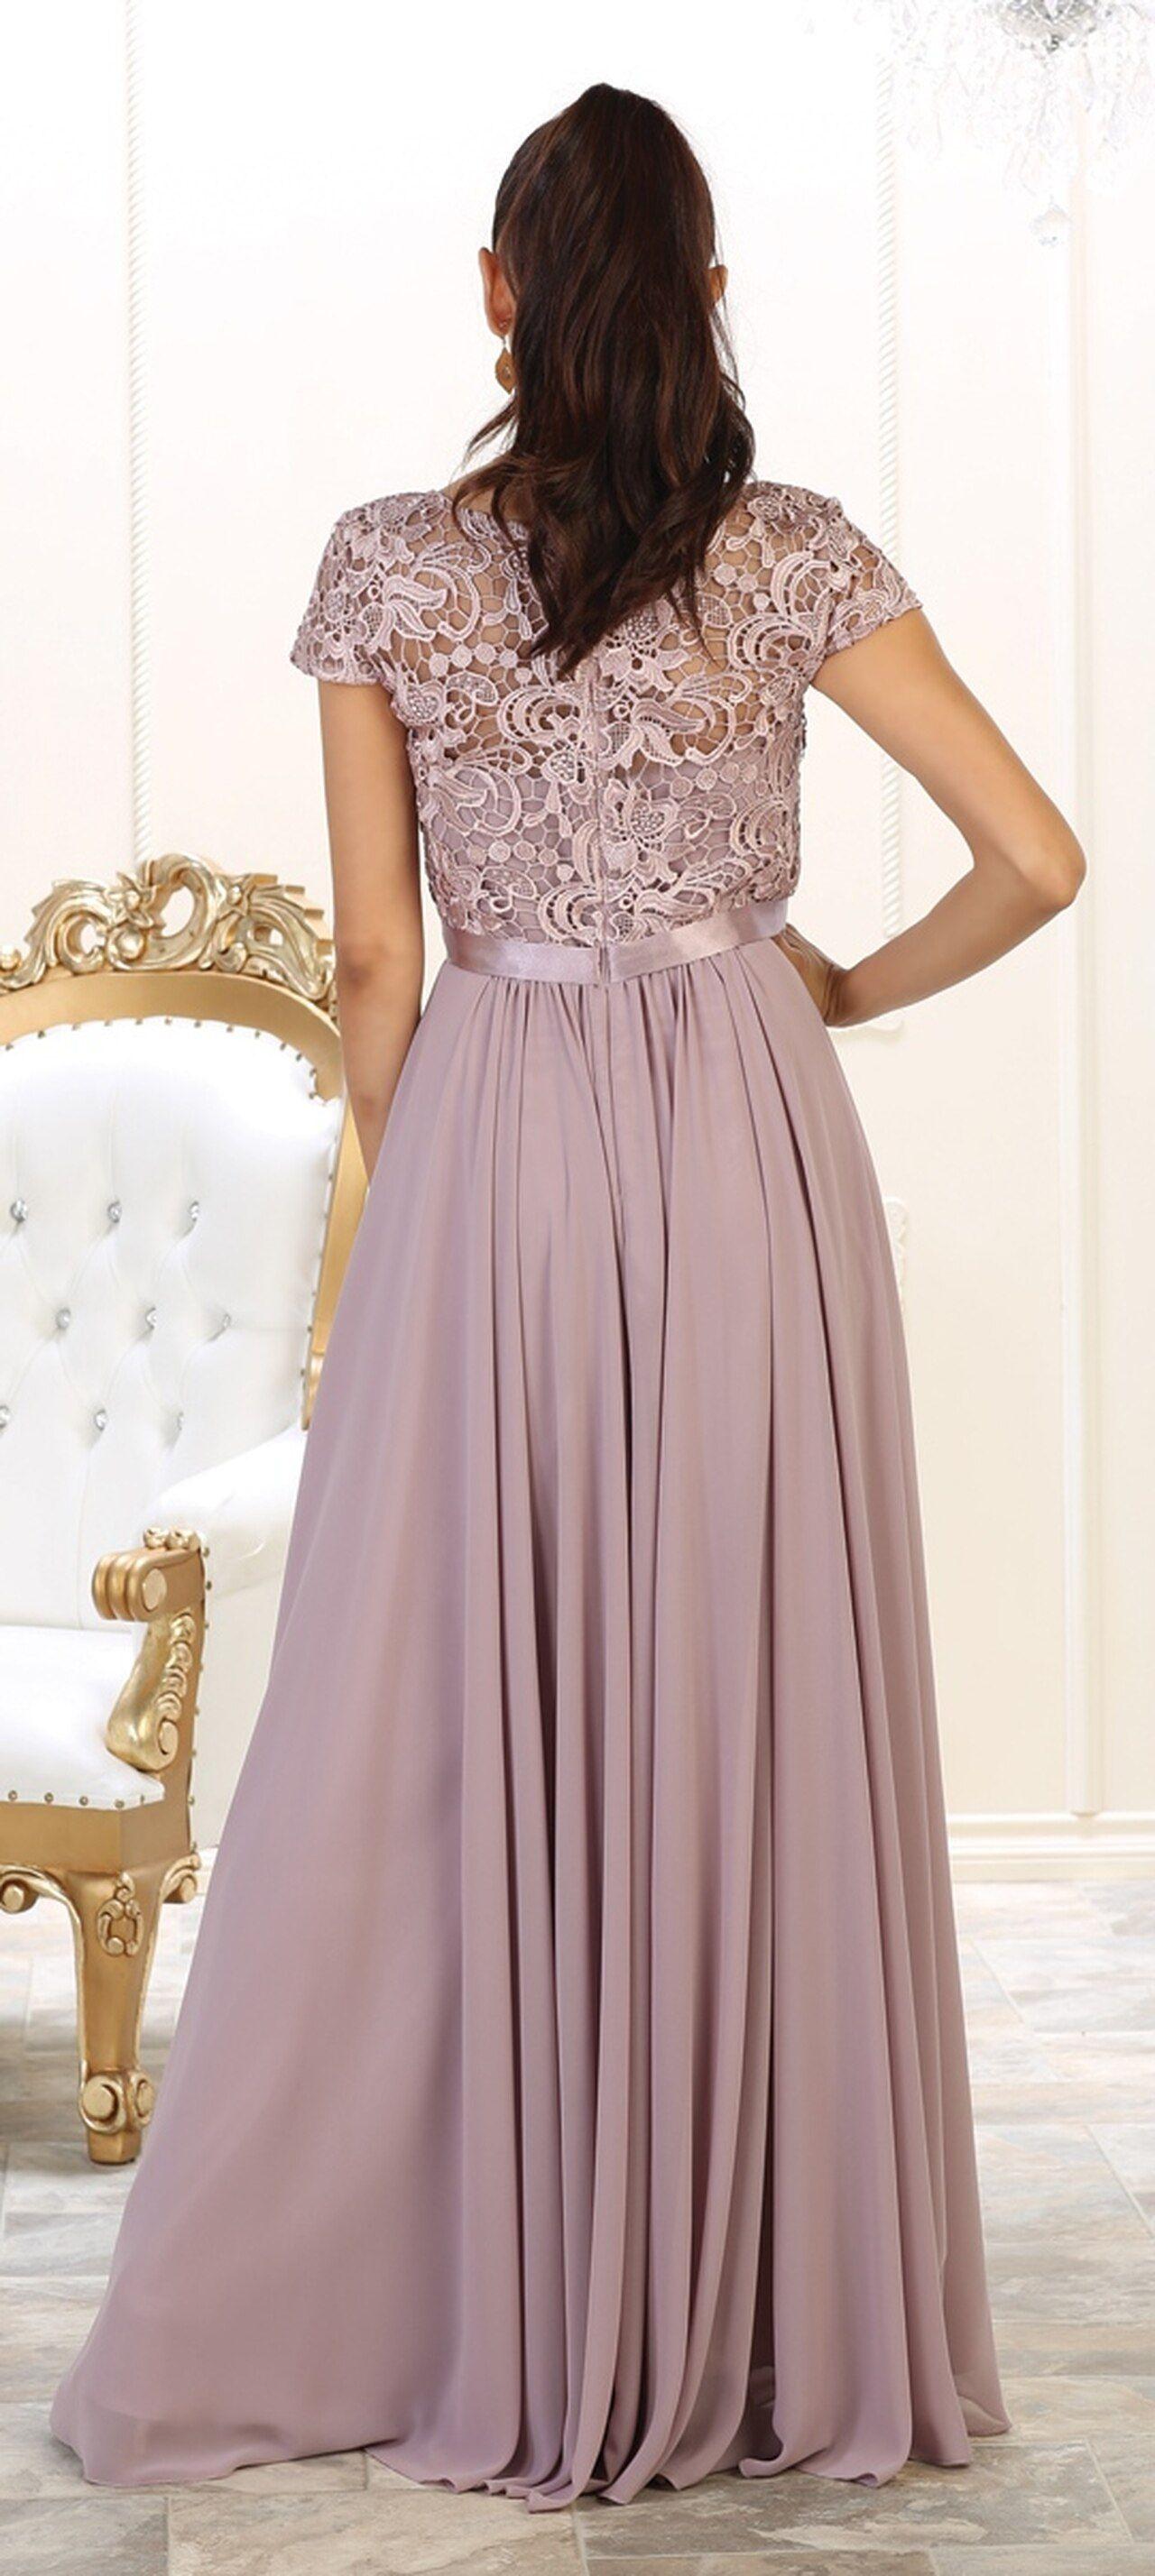 Mq1486 Mother S Formal Modest Long Dresses Bridesmaid Dresses Plus Size Classy Dress [ 2856 x 1280 Pixel ]